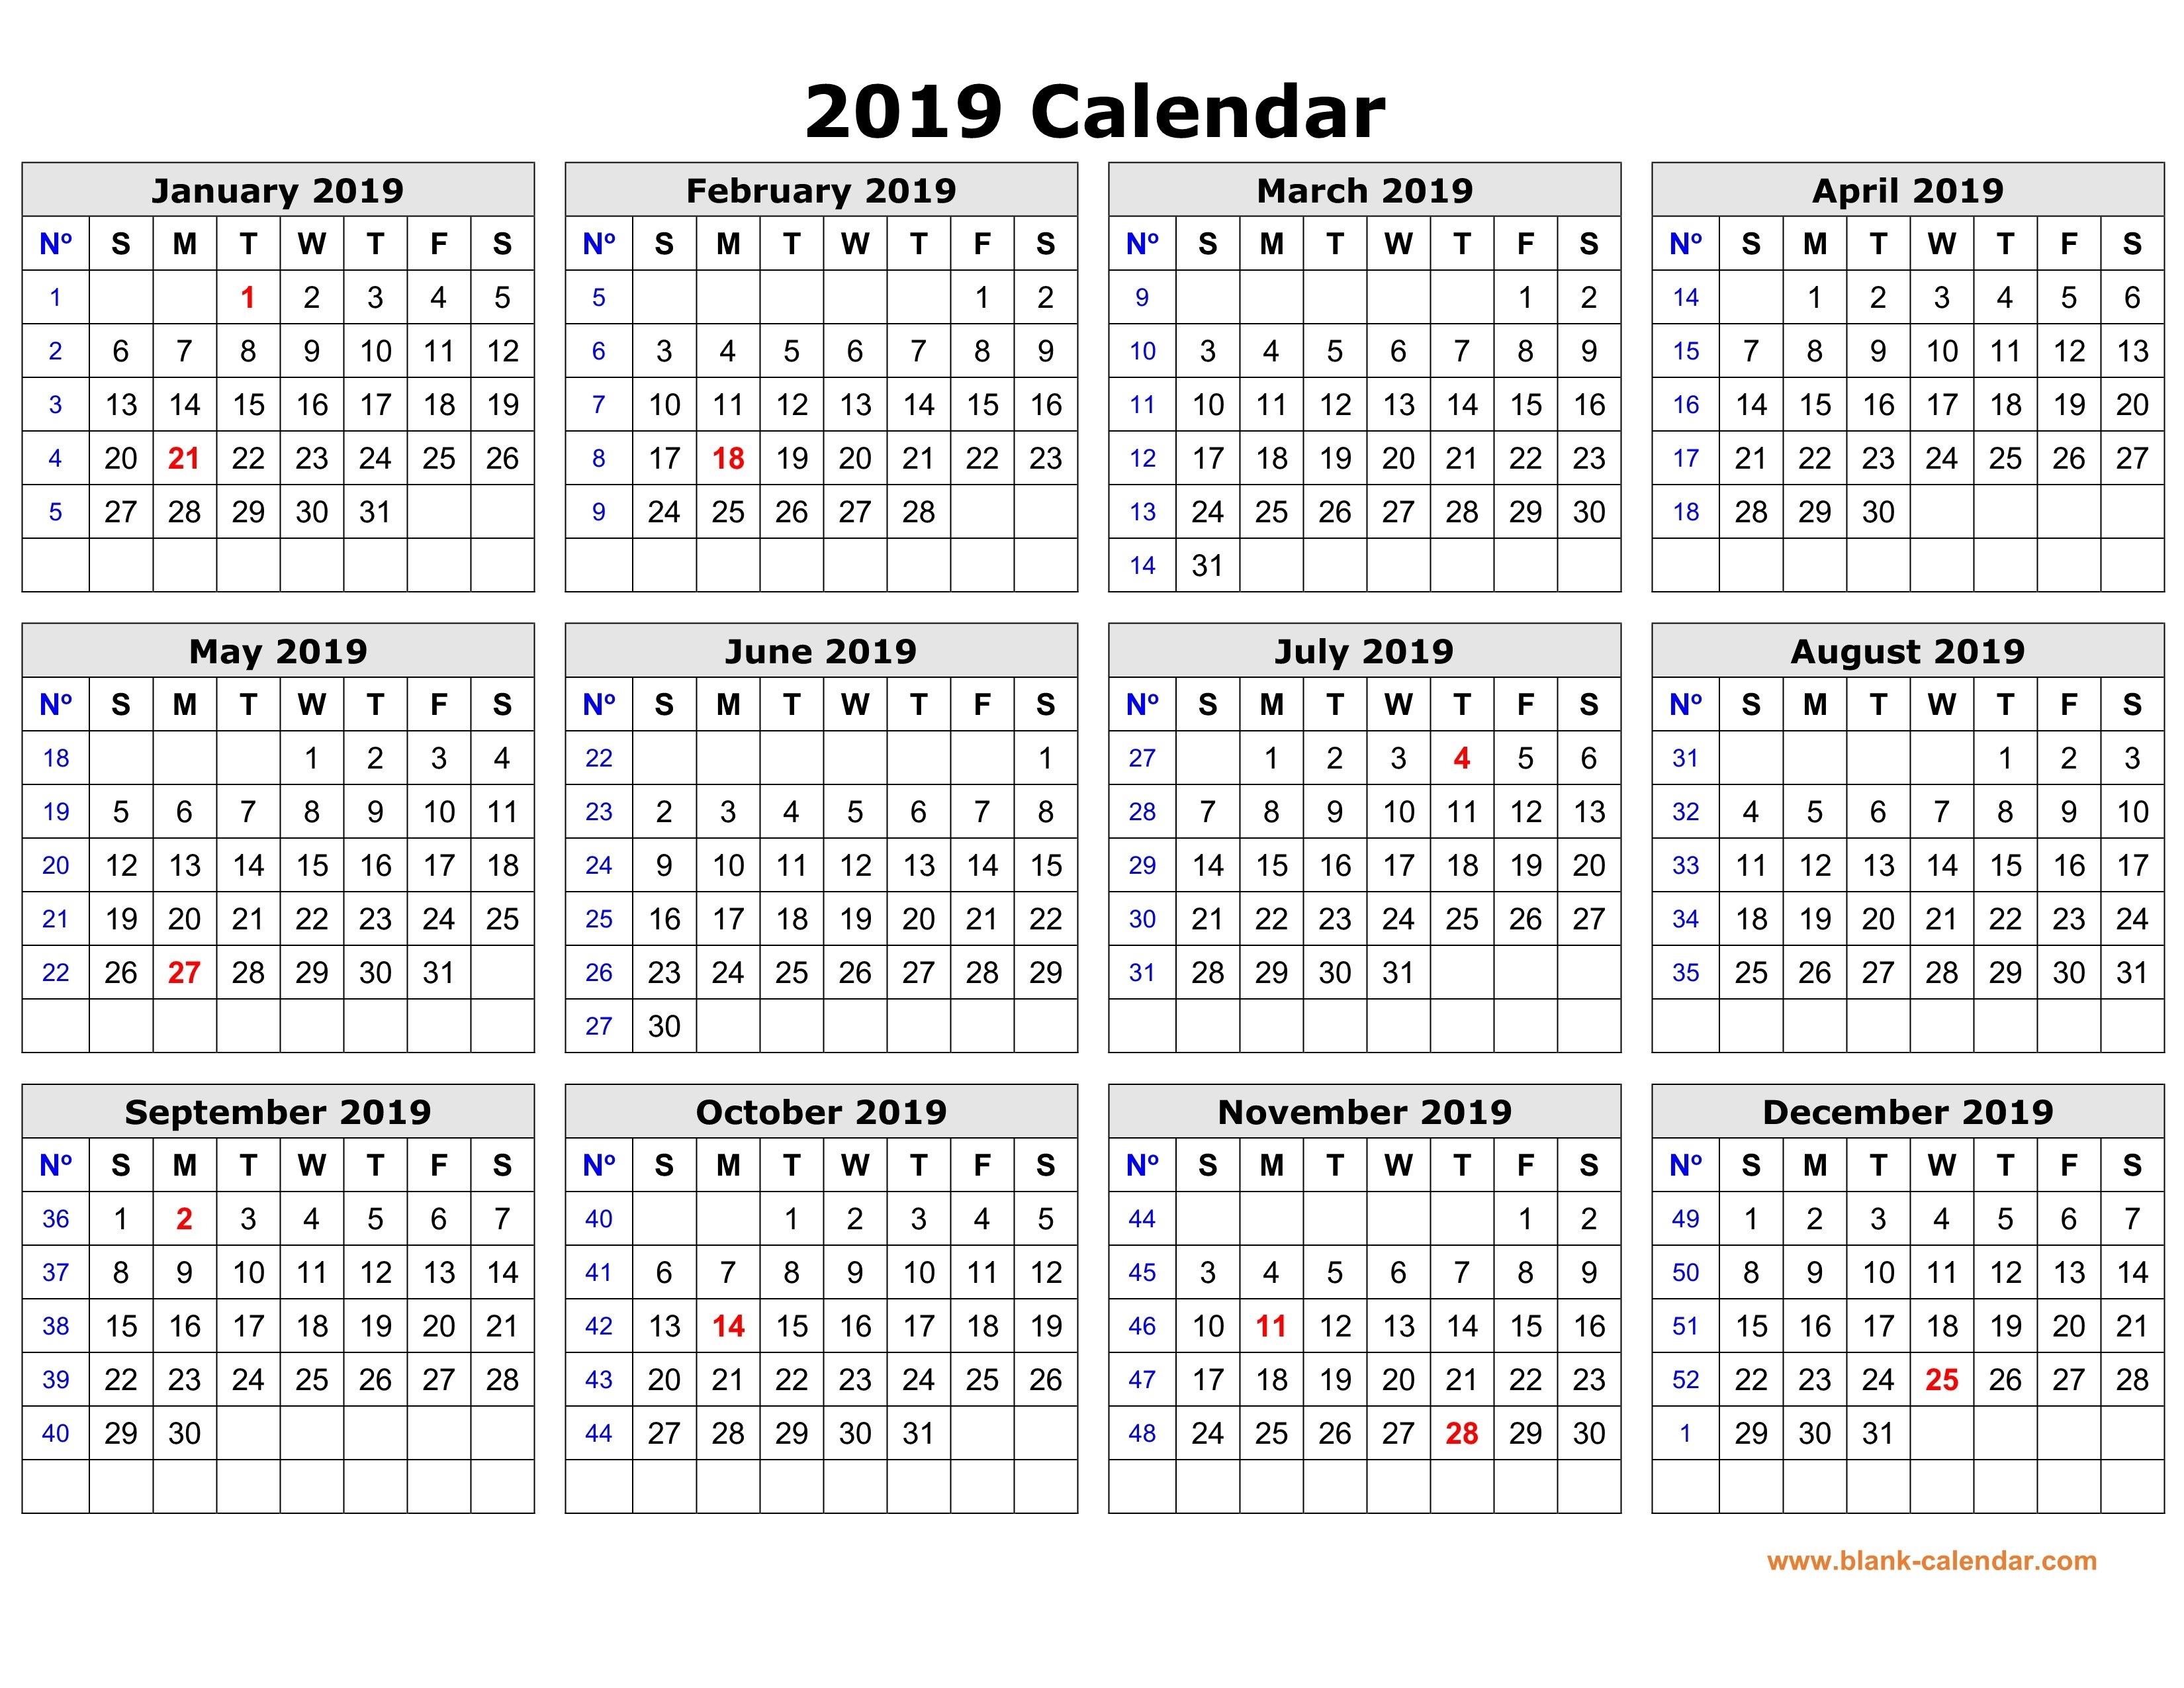 Free Download Printable Calendar 2019 In One Page, Clean Design. Calendar 2019 Free Print